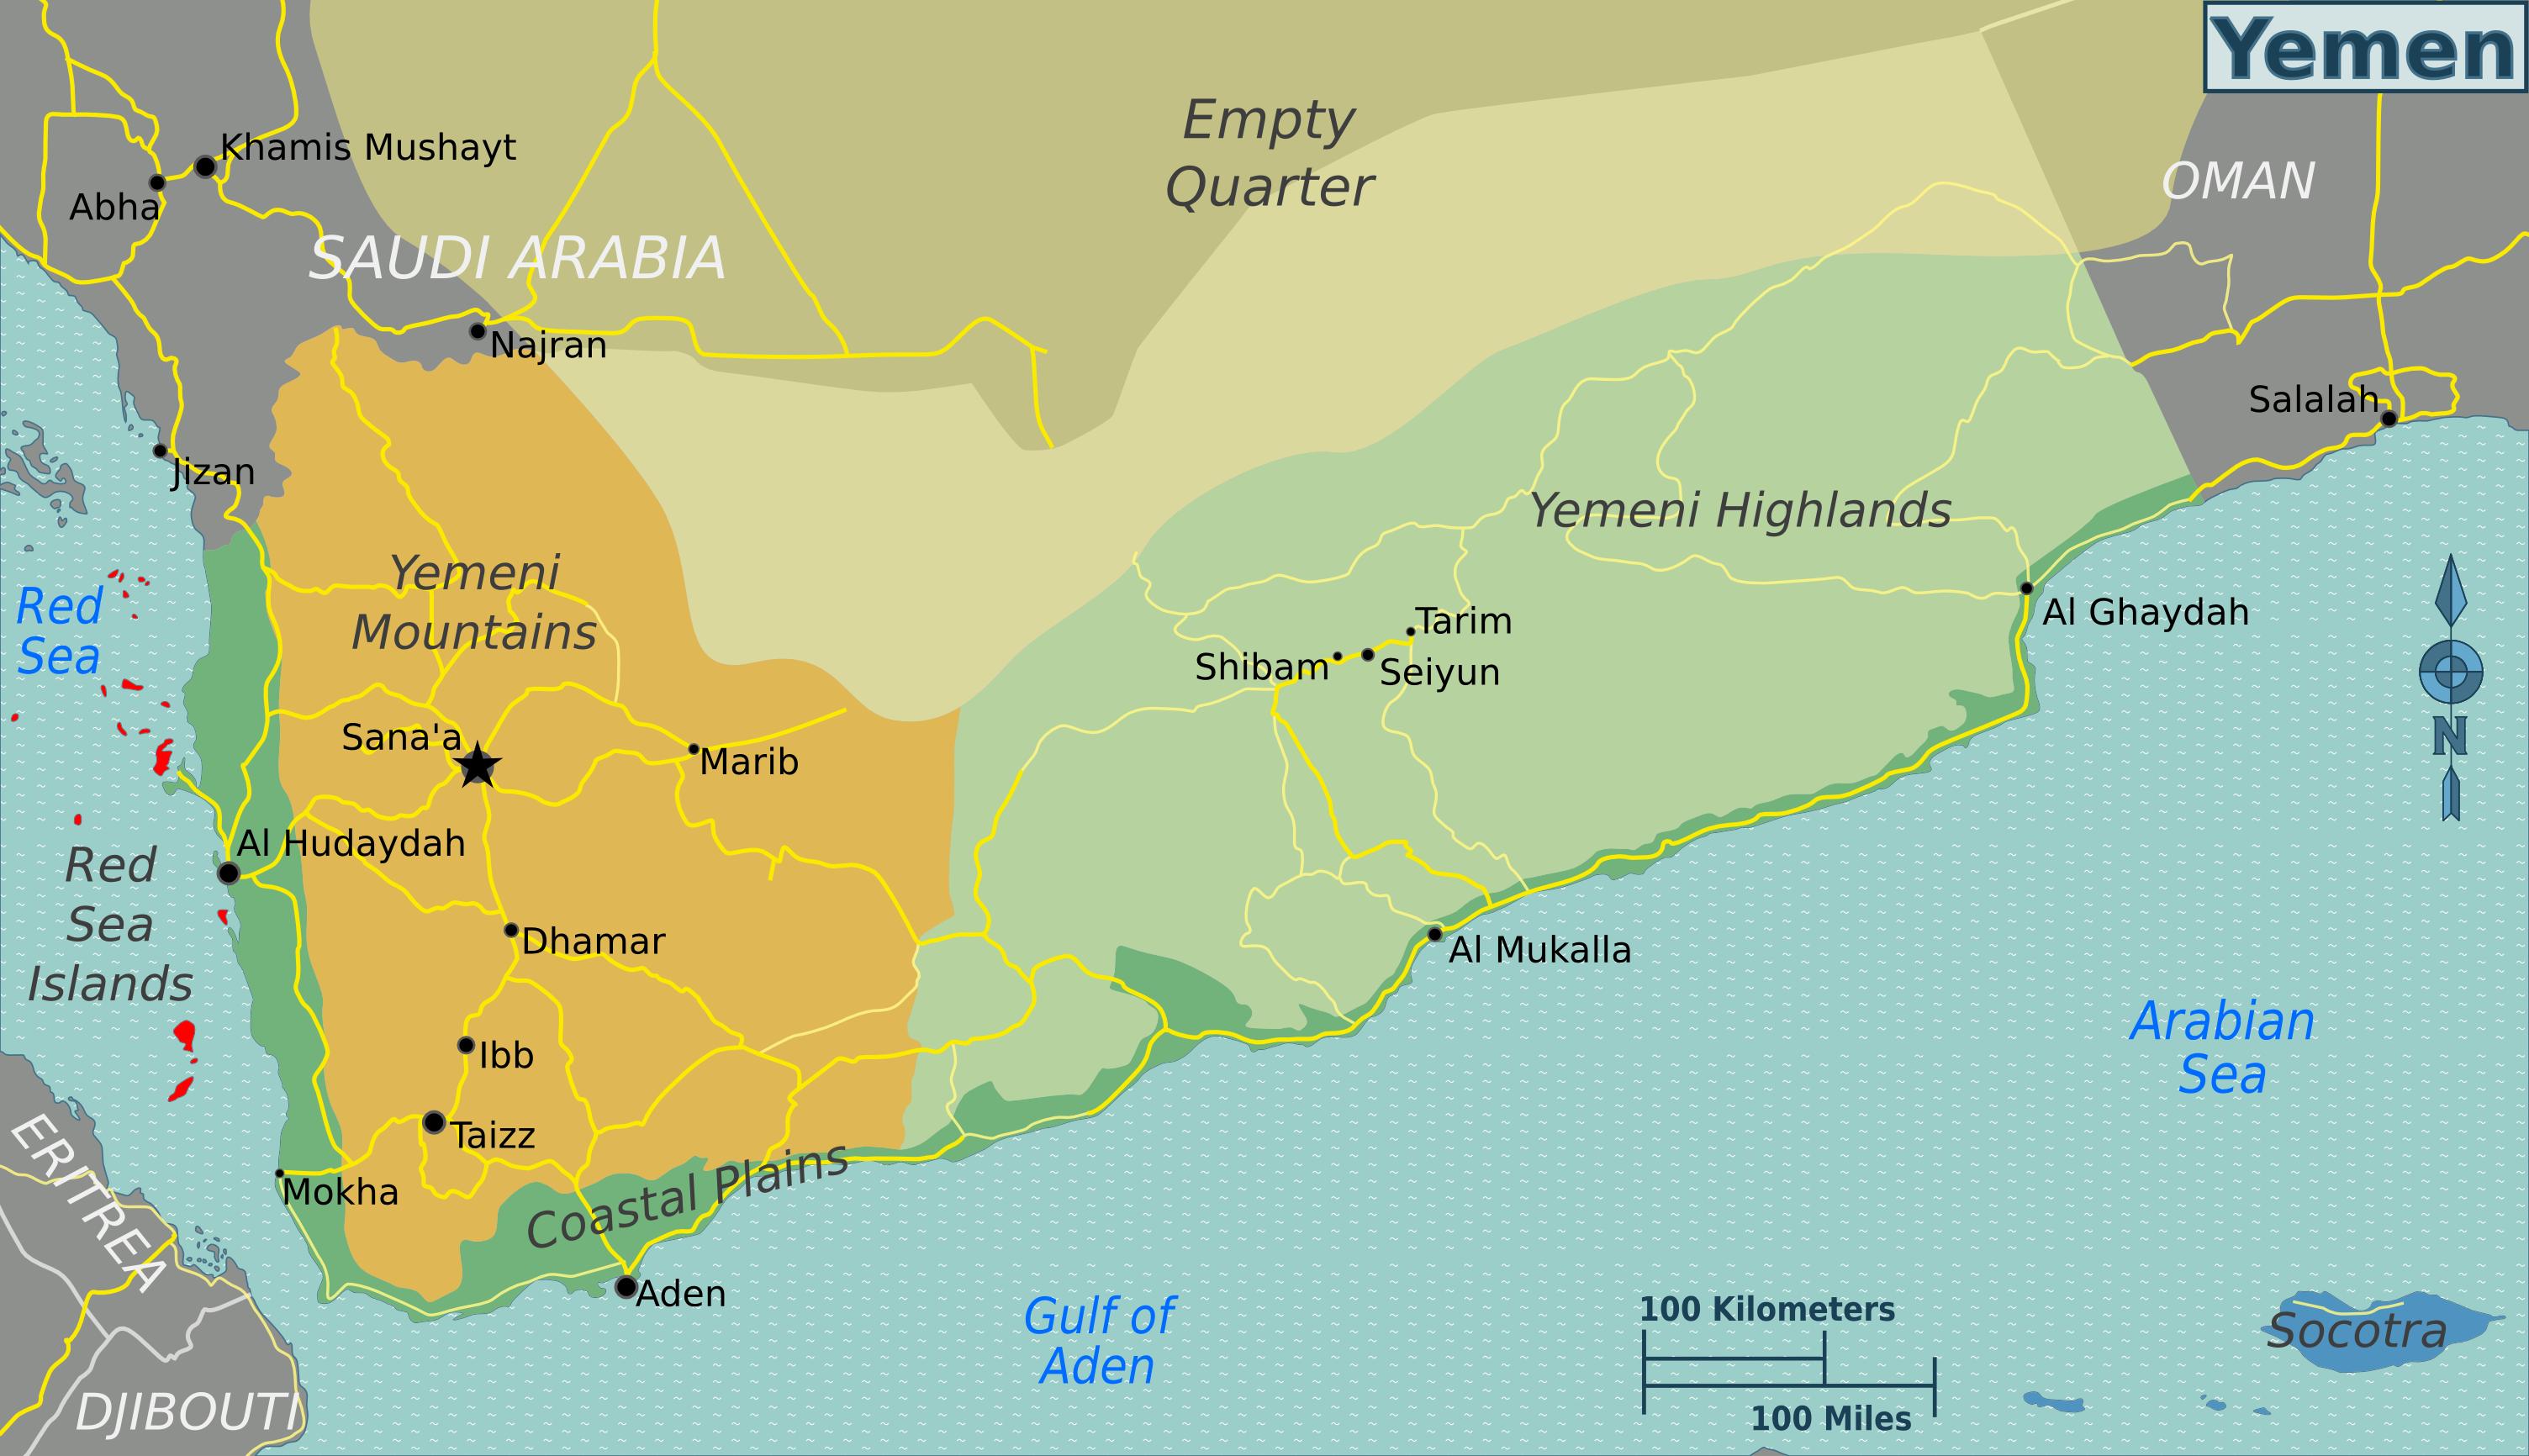 Map Of Yemen Regions Weltkarte Com Karten Und Stadtplane Der